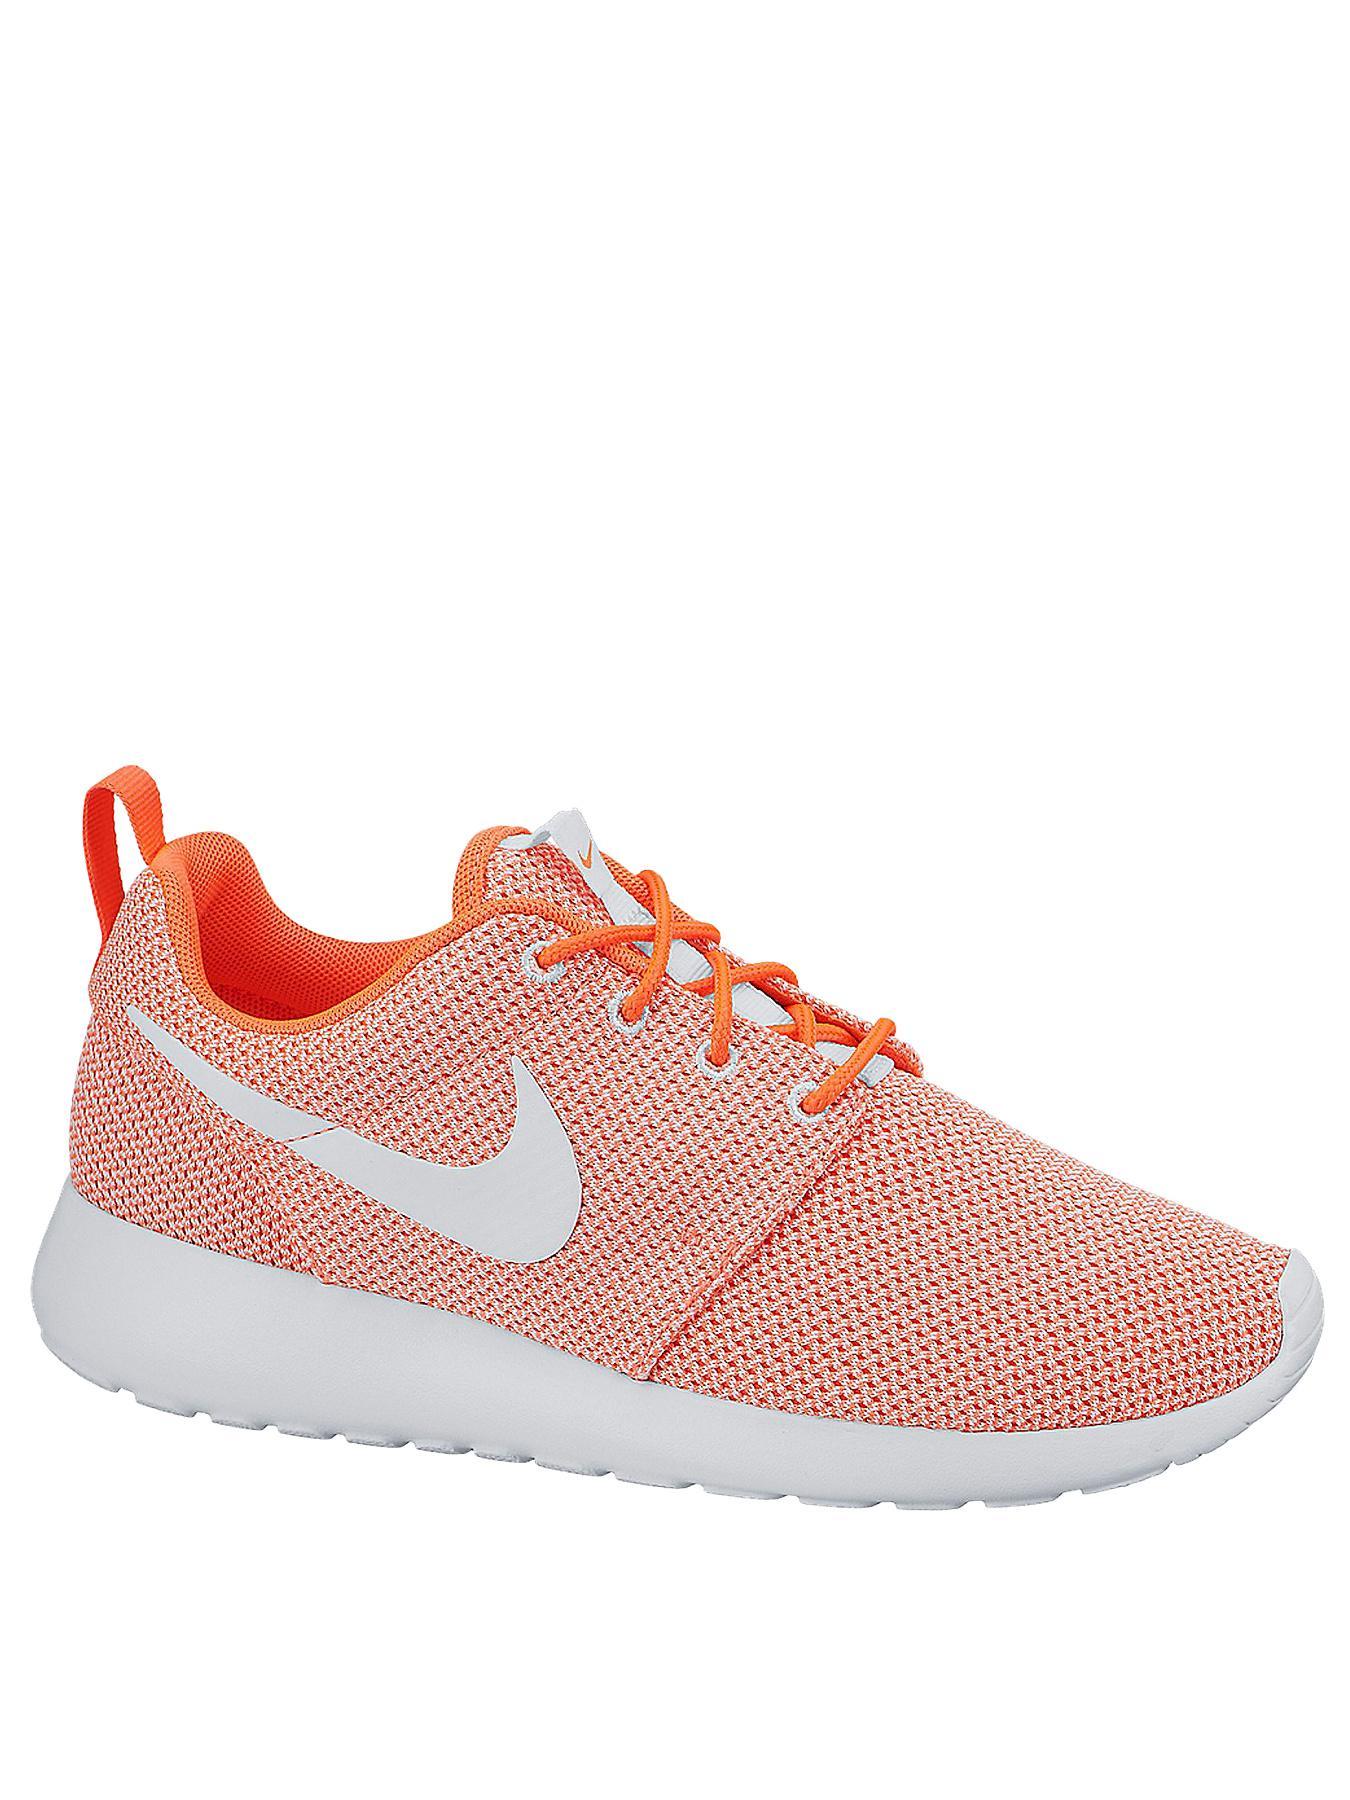 d9406e233edcd roshe nike trainers